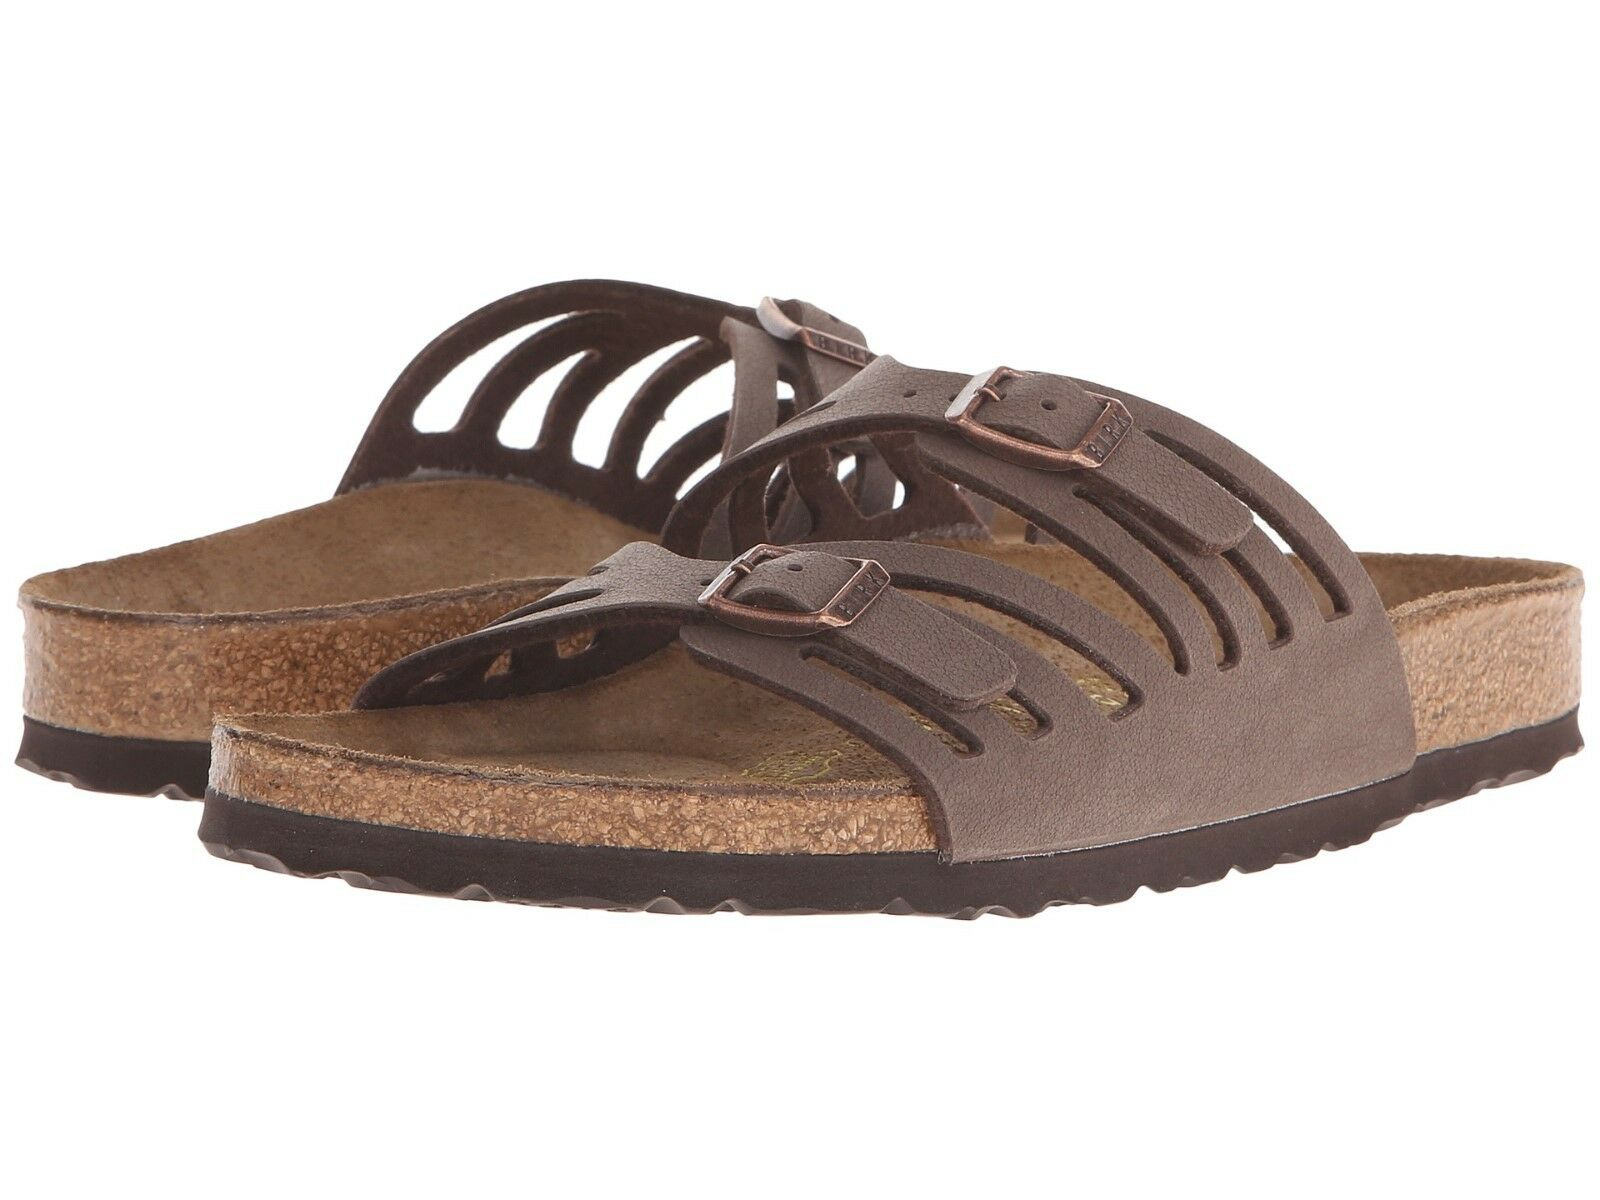 Aldo Womens Hawaii Gladiator Sandal- Pick SZ/Color.